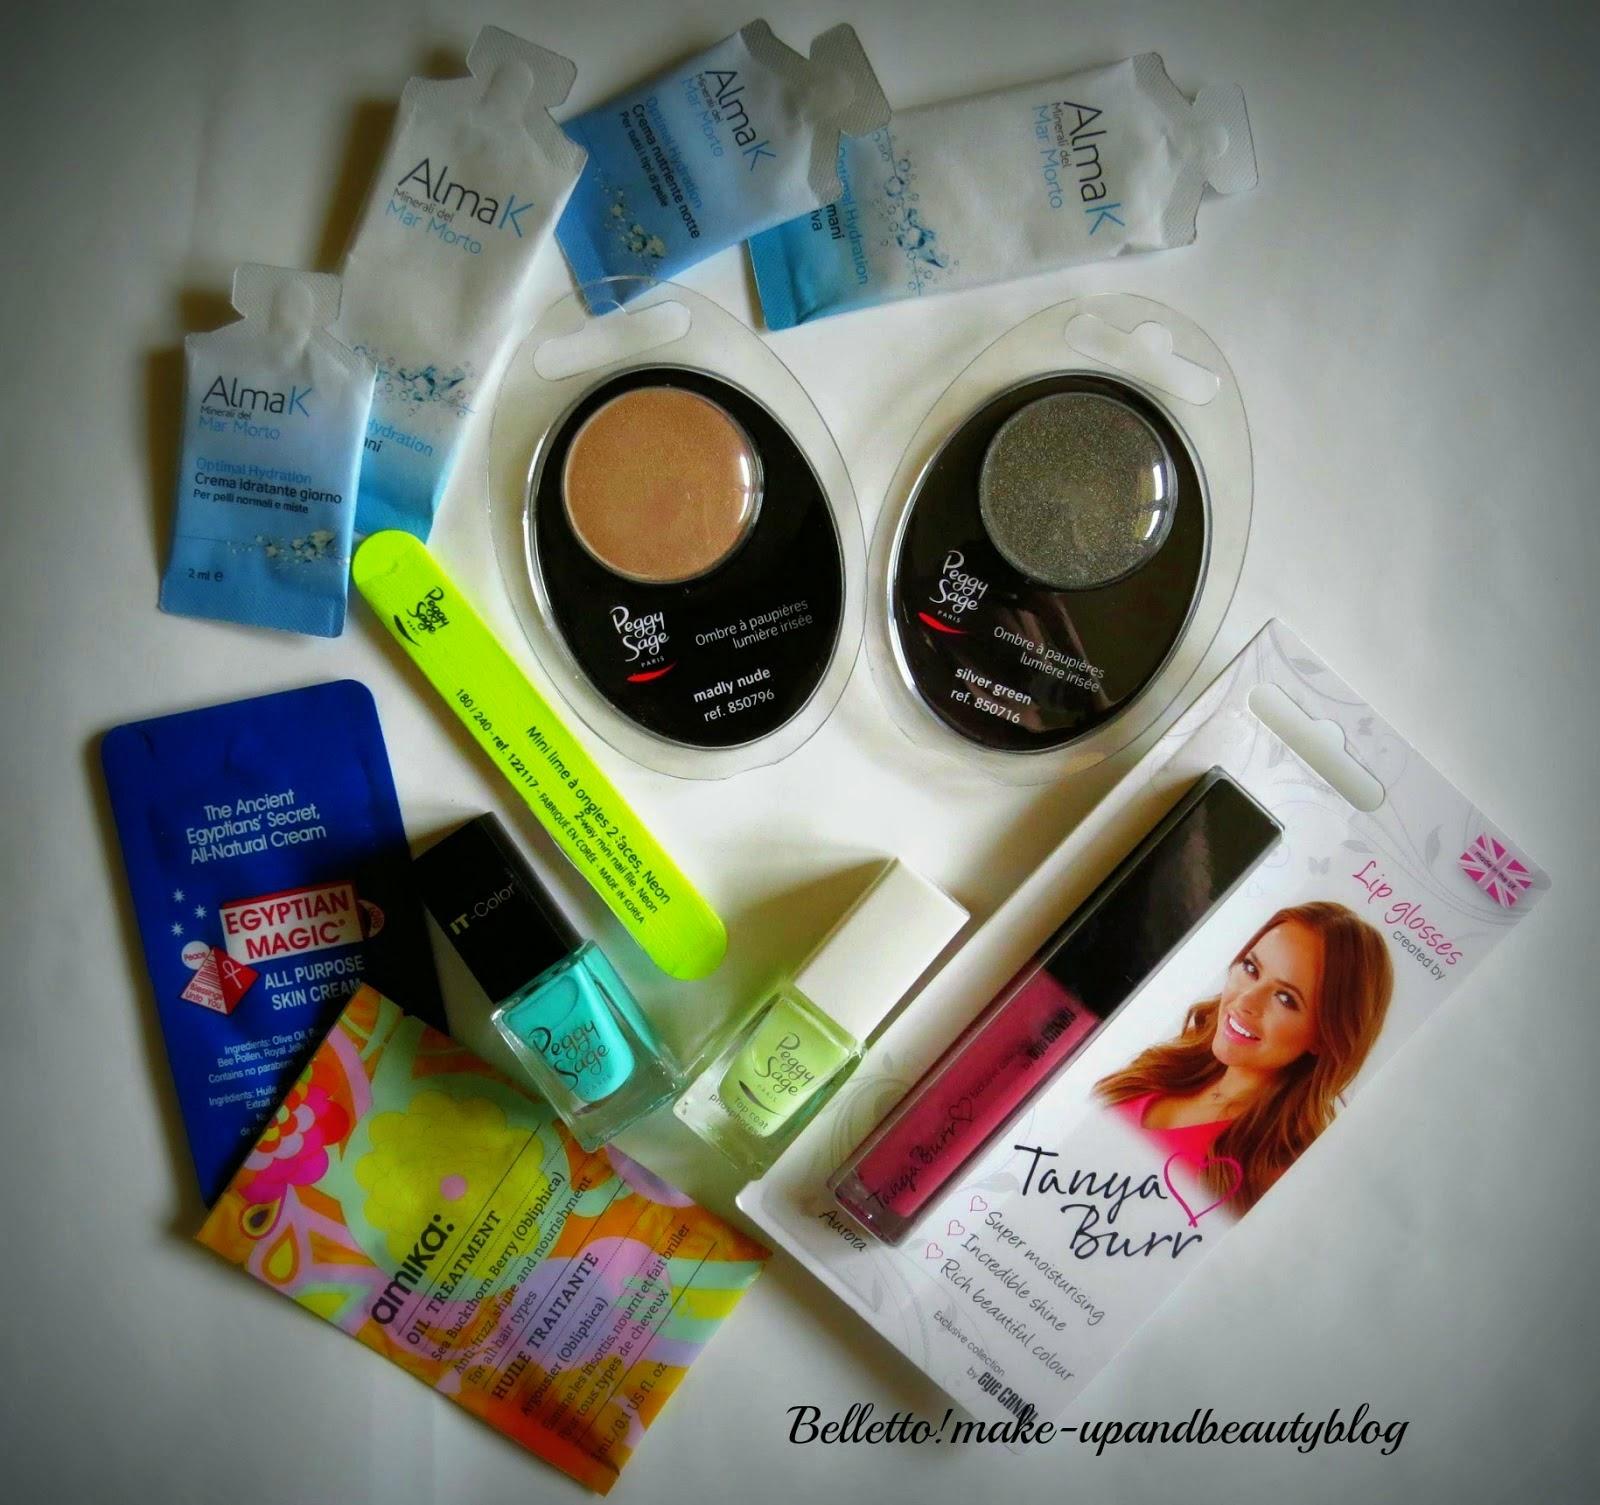 http://bellettomake-upandbeautyblog.blogspot.it/2014/04/giveaway-un-piccolo-assaggio-di.html?showComment=1397218504271#c4118744666635456787